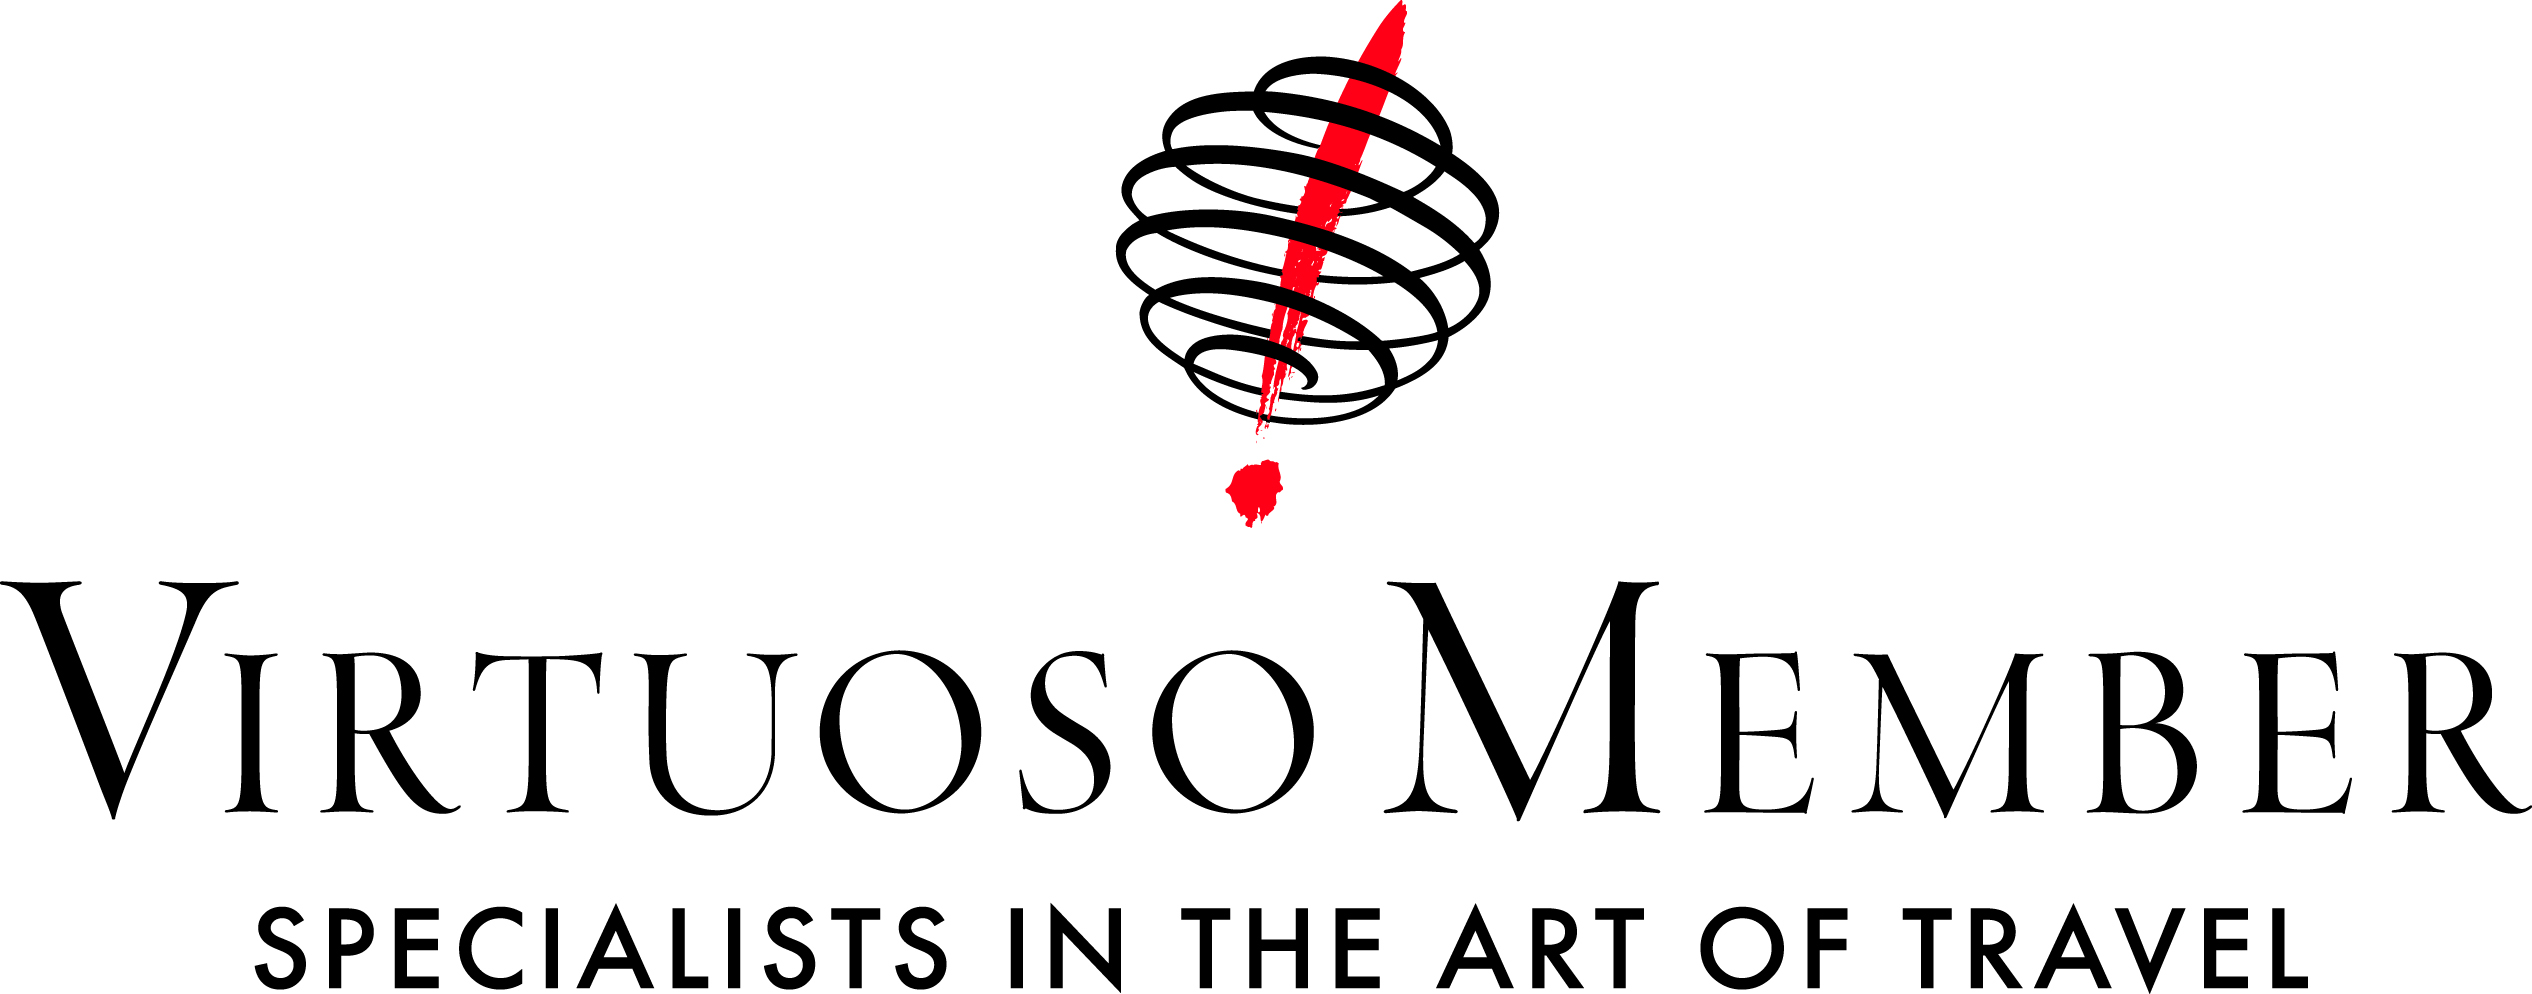 Virtuoso Member Logo.